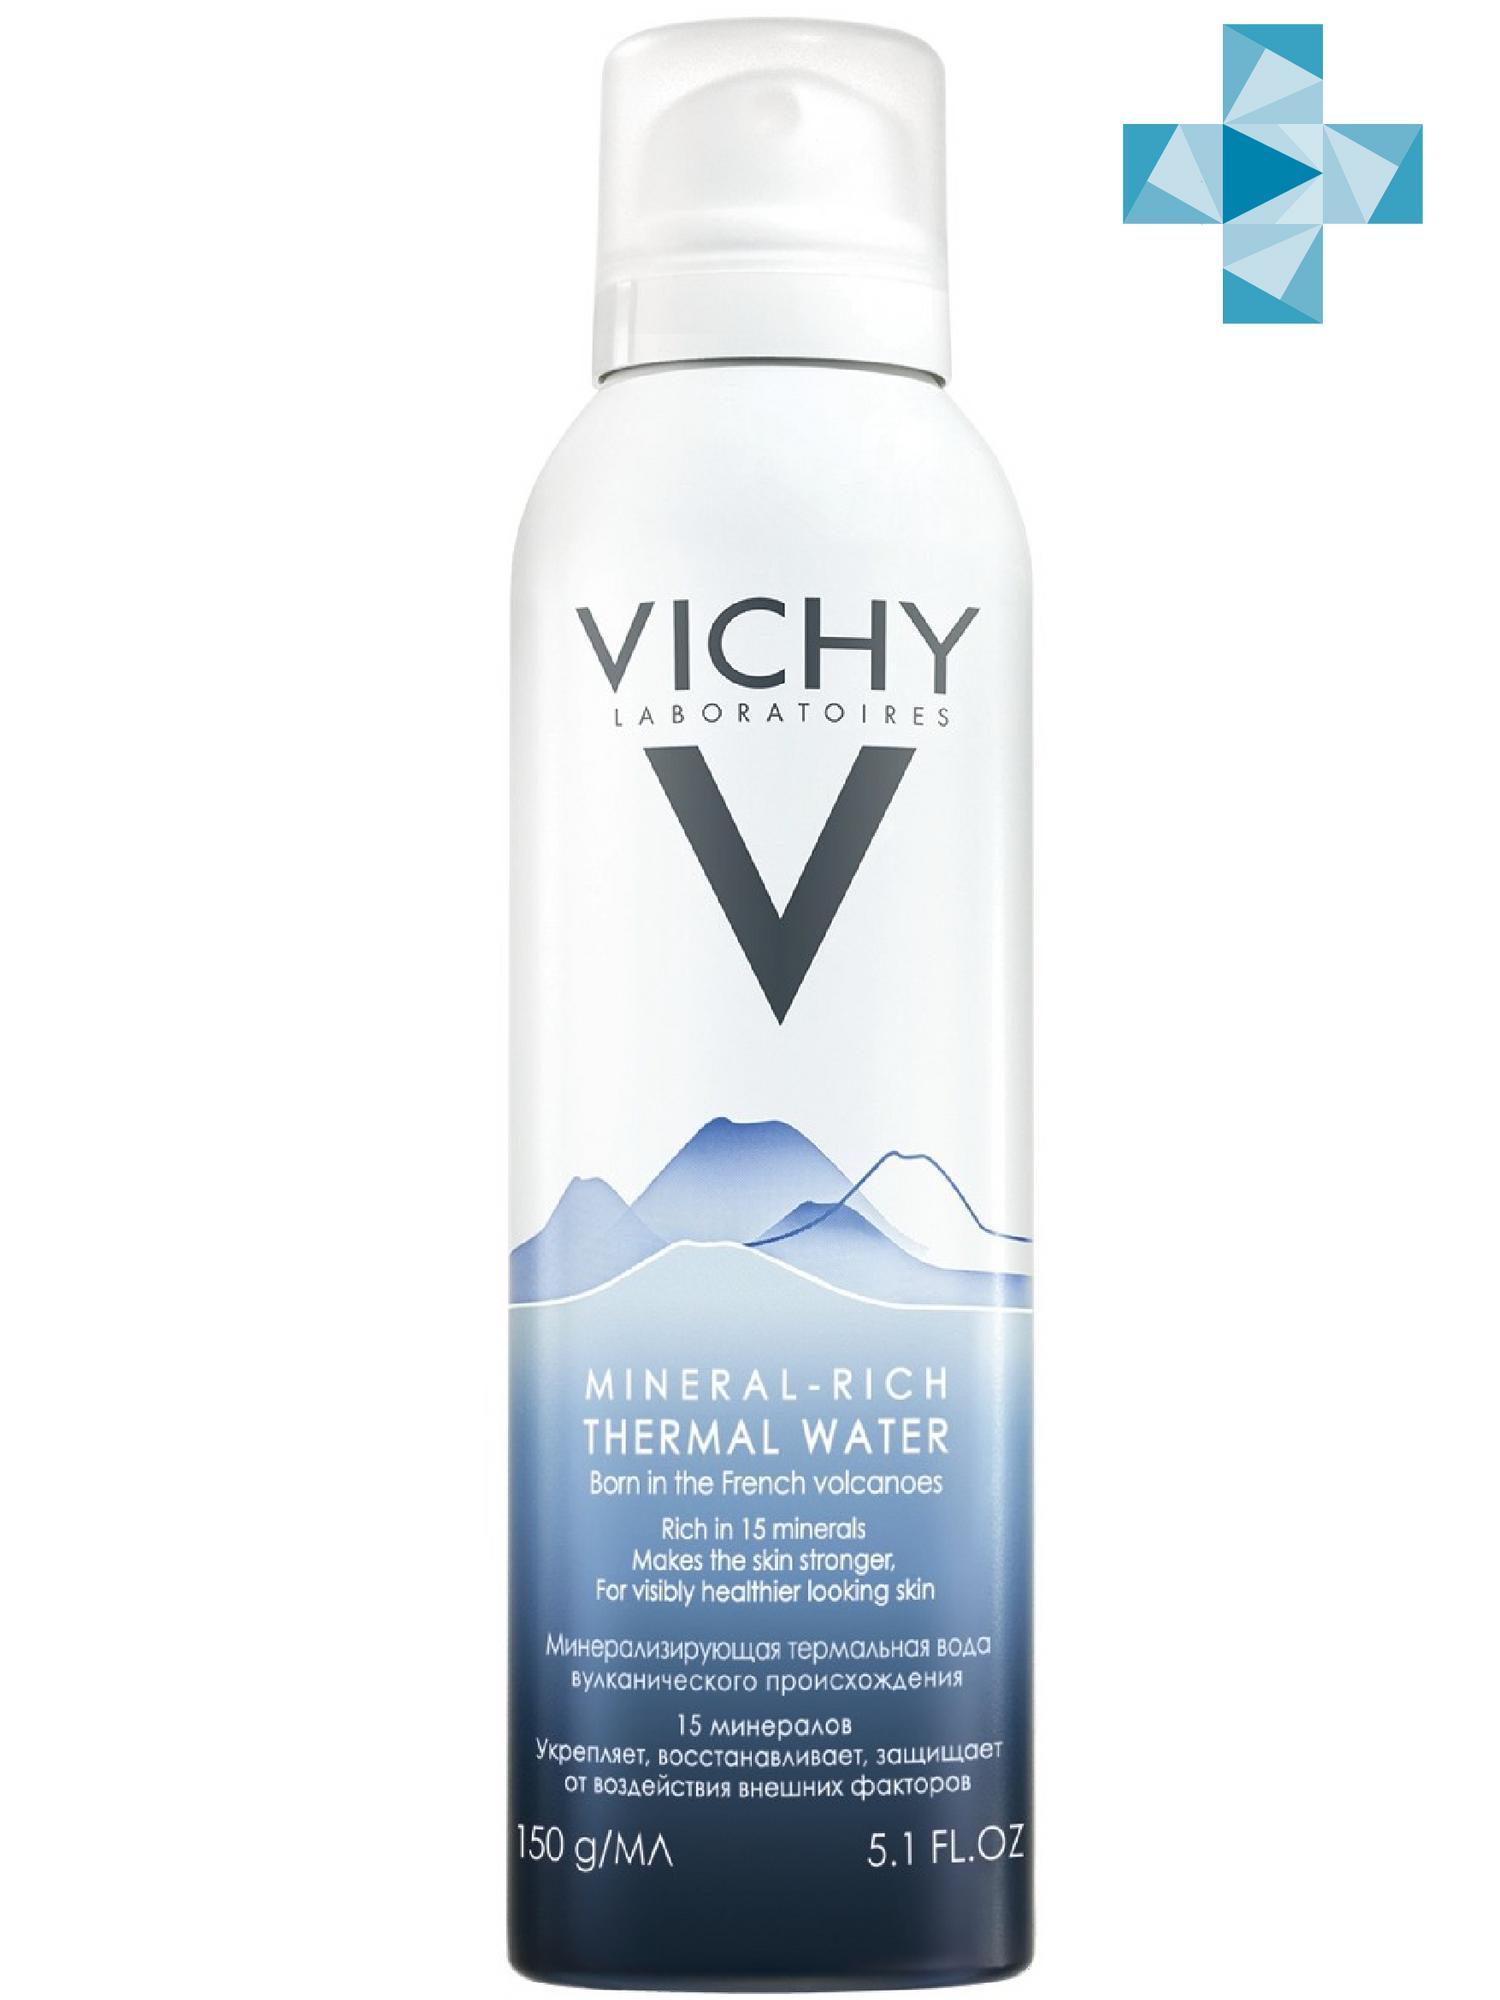 Vichy Термальная Вода Vichy Спа 150 мл (Vichy, Thermal Water Vichy) vichy 50ml